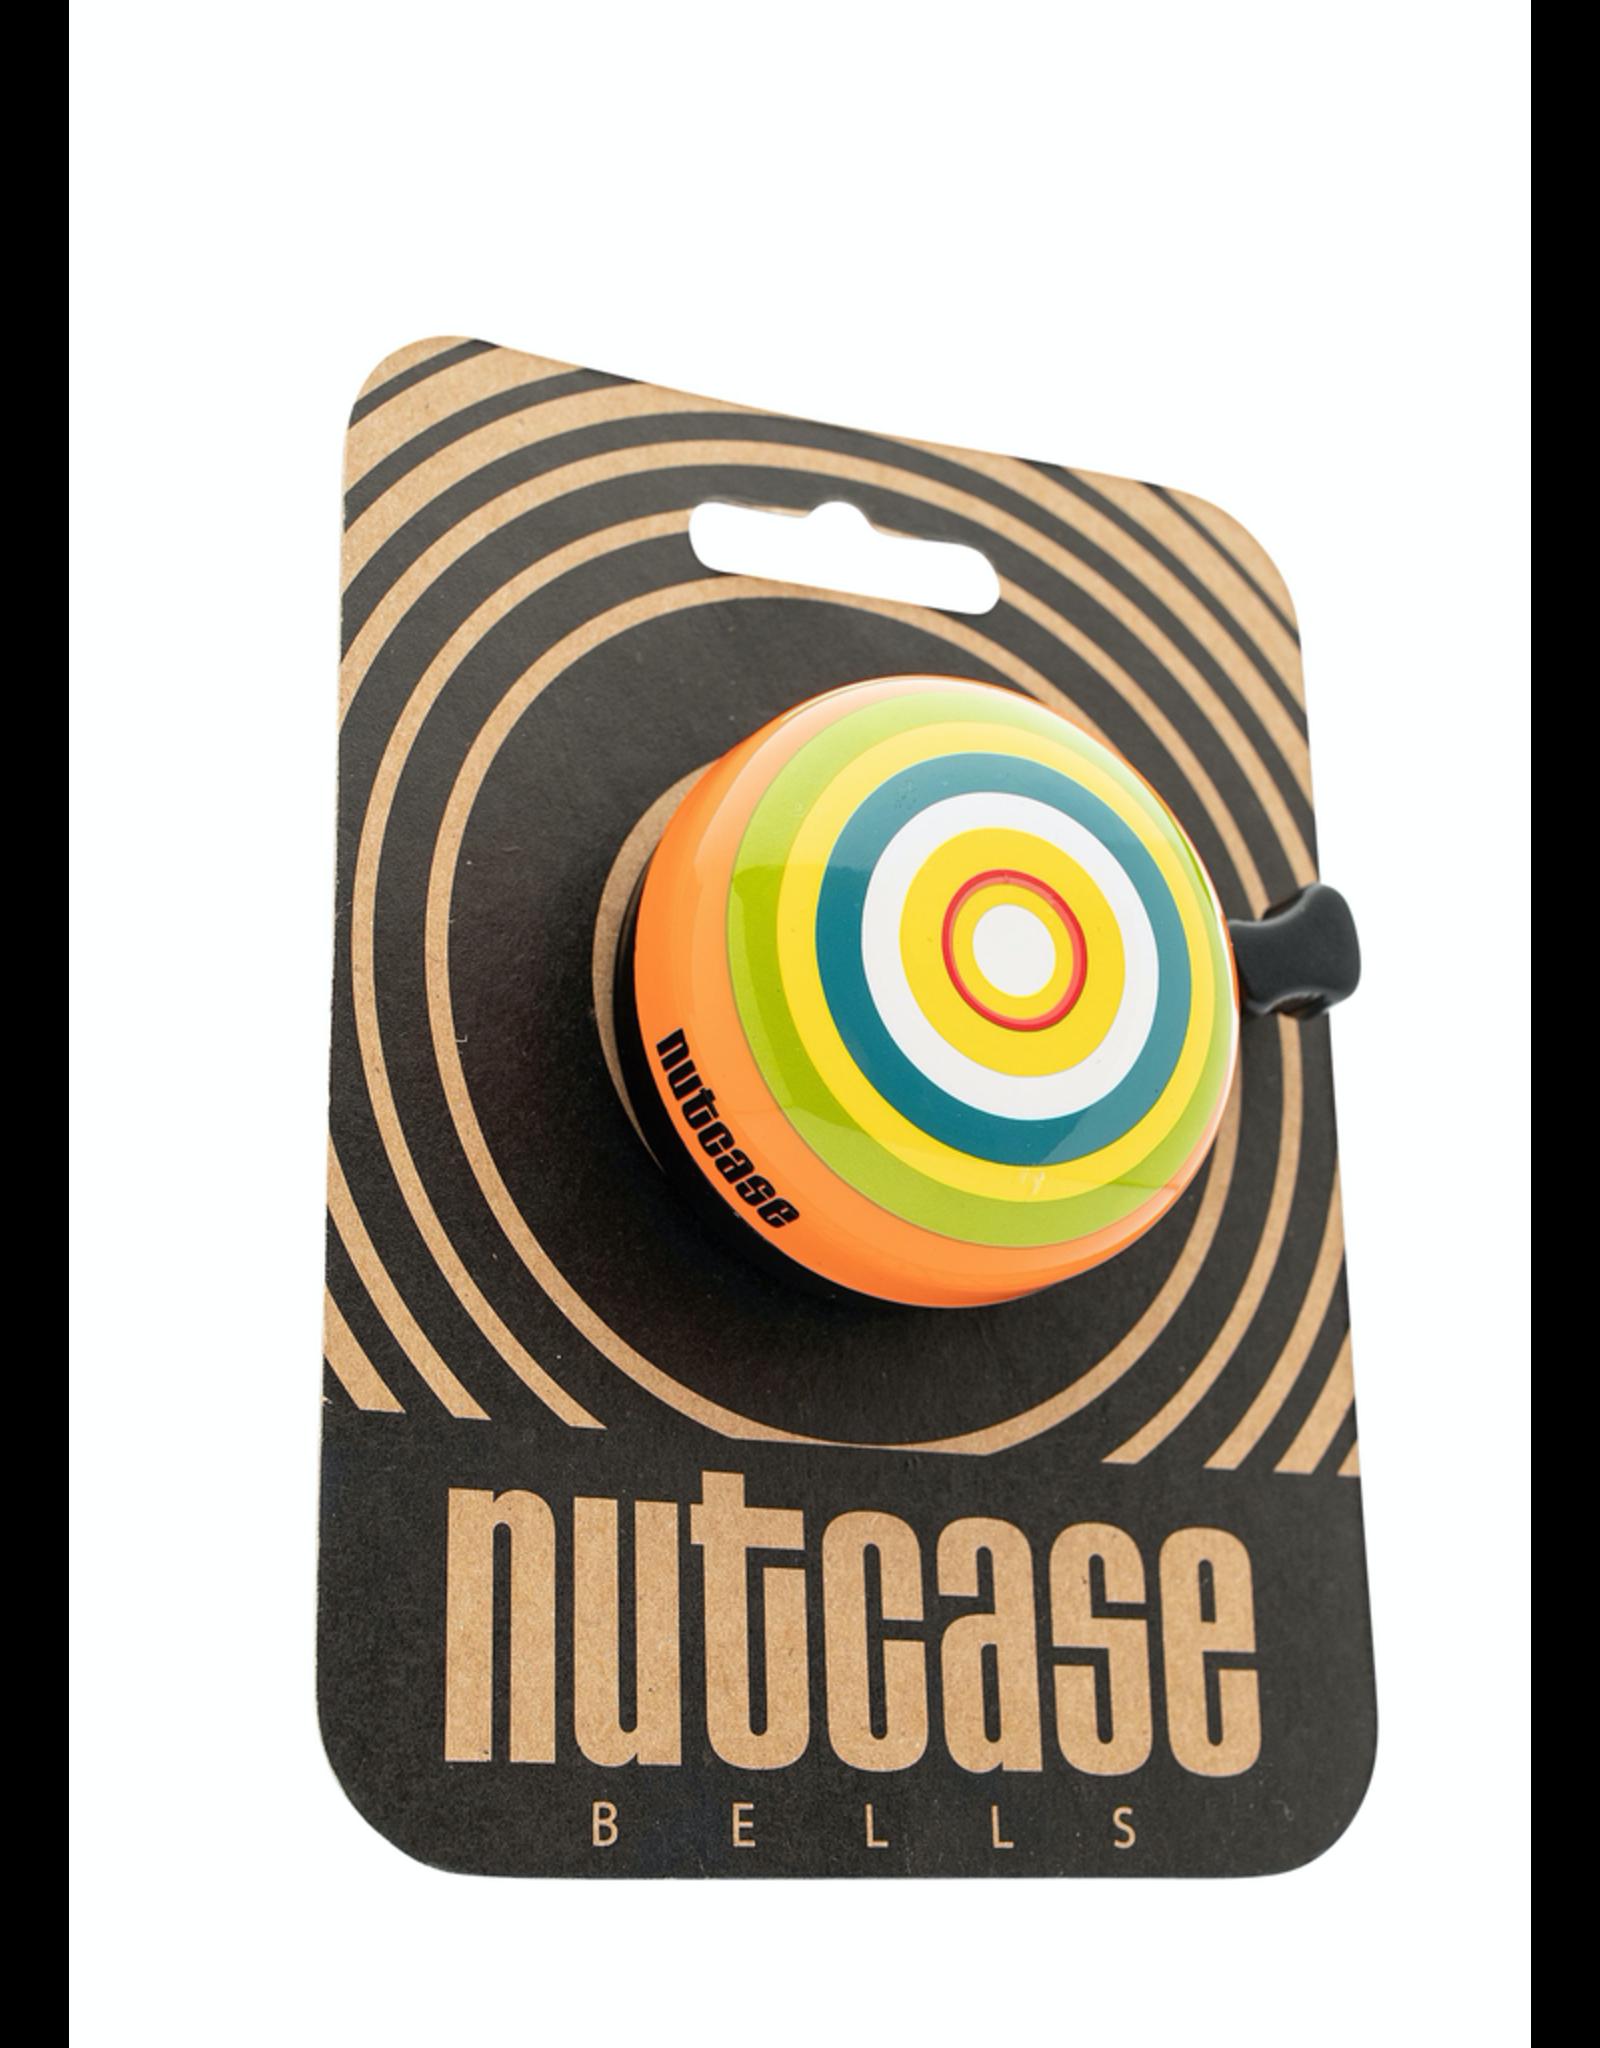 Nutcase Beach Life - Large Bell